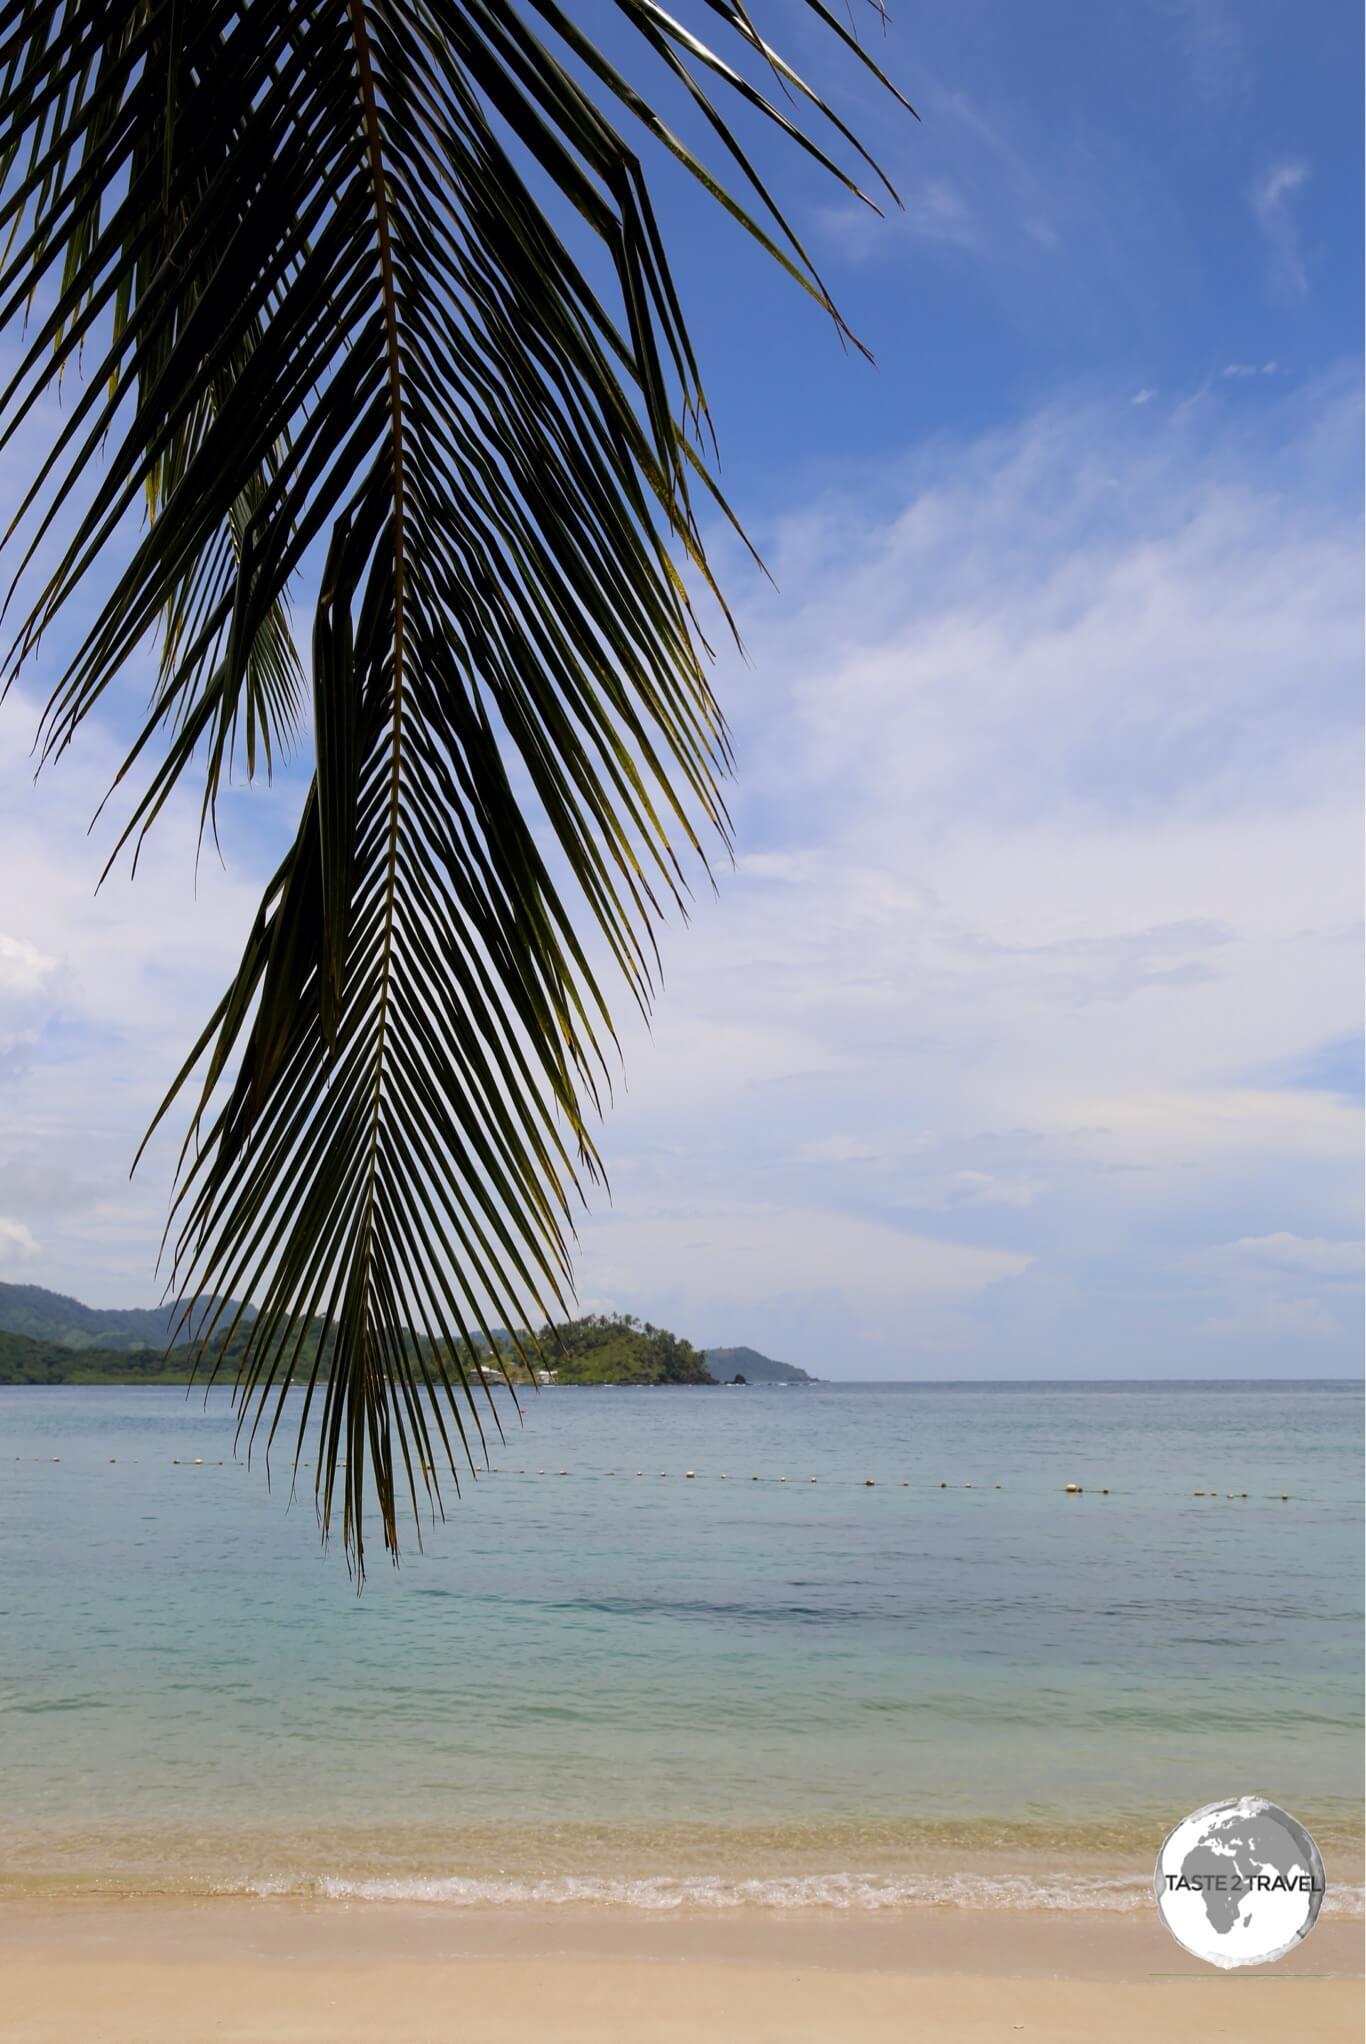 Playa Blanca on the Caribbean island of Isla Grande.